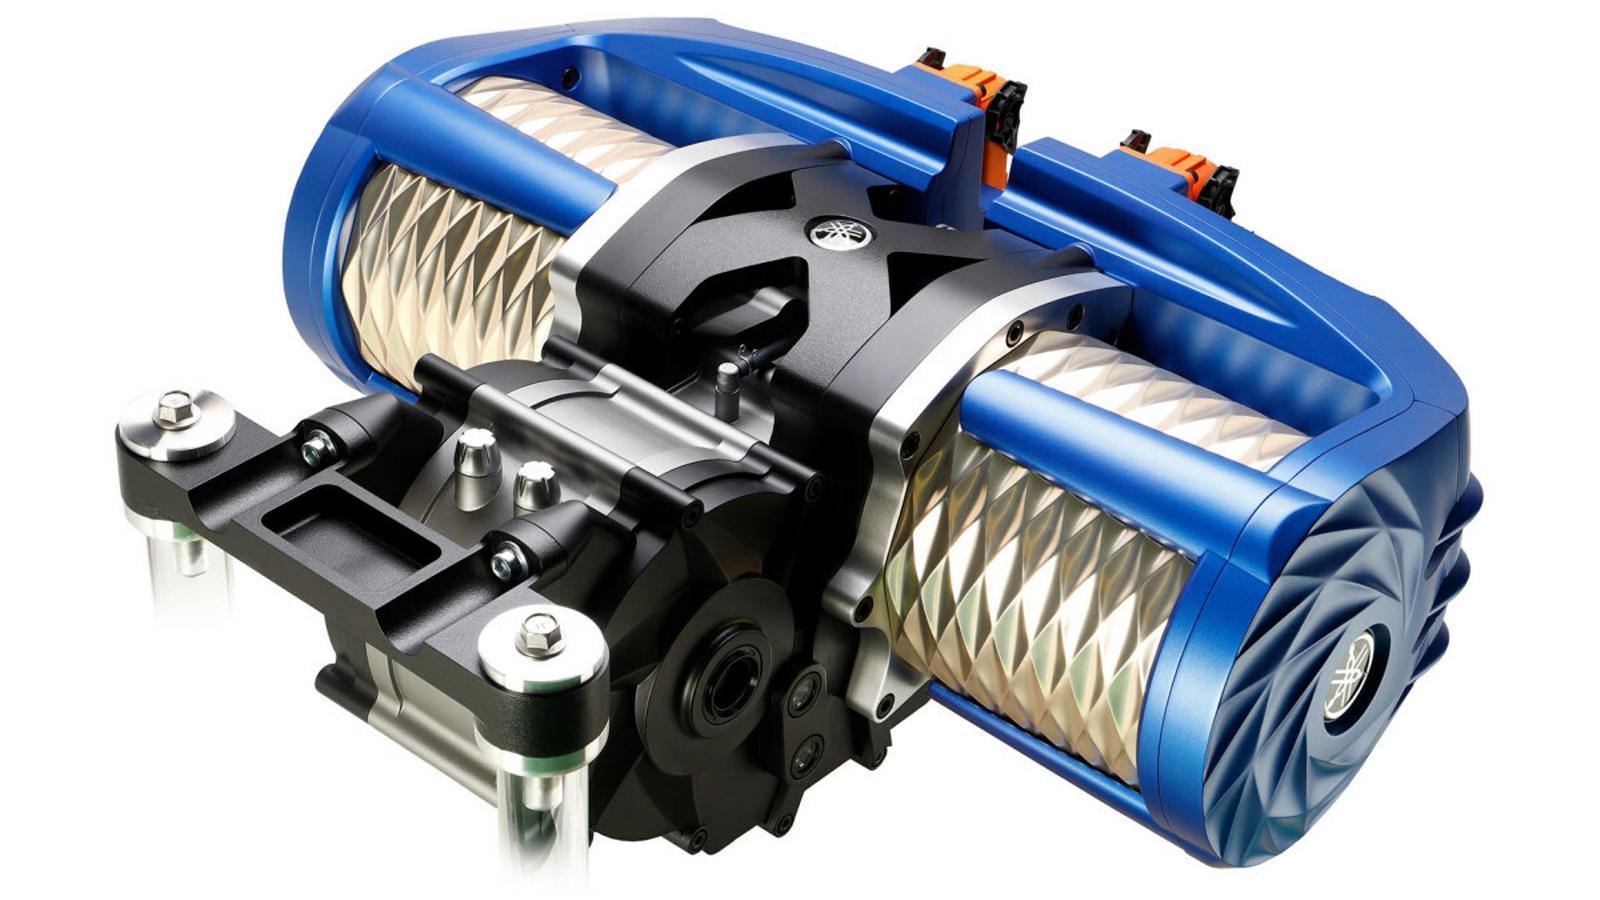 Yamaha presenta un motor elèctric de 150 CV adaptable a diversos vehicles